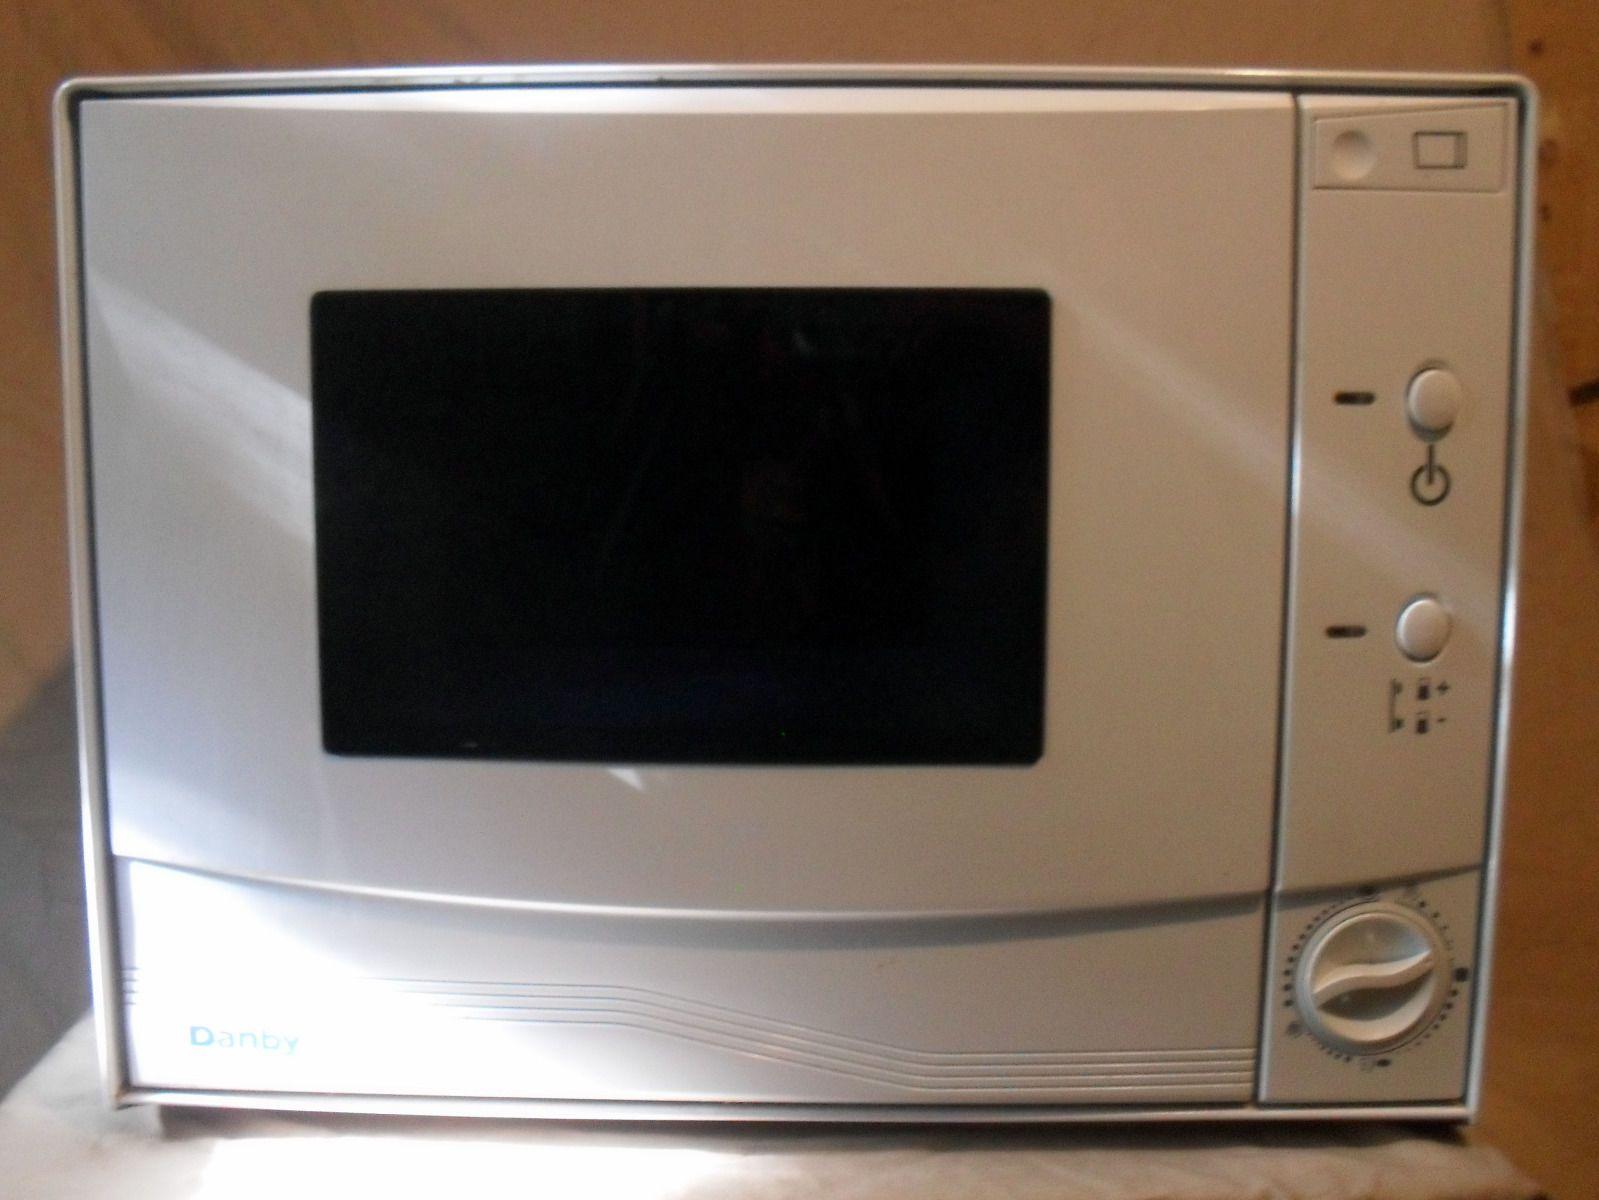 Sold Http Www Ebay Com Itm Danby Countertop Dishwasher Ddw396w